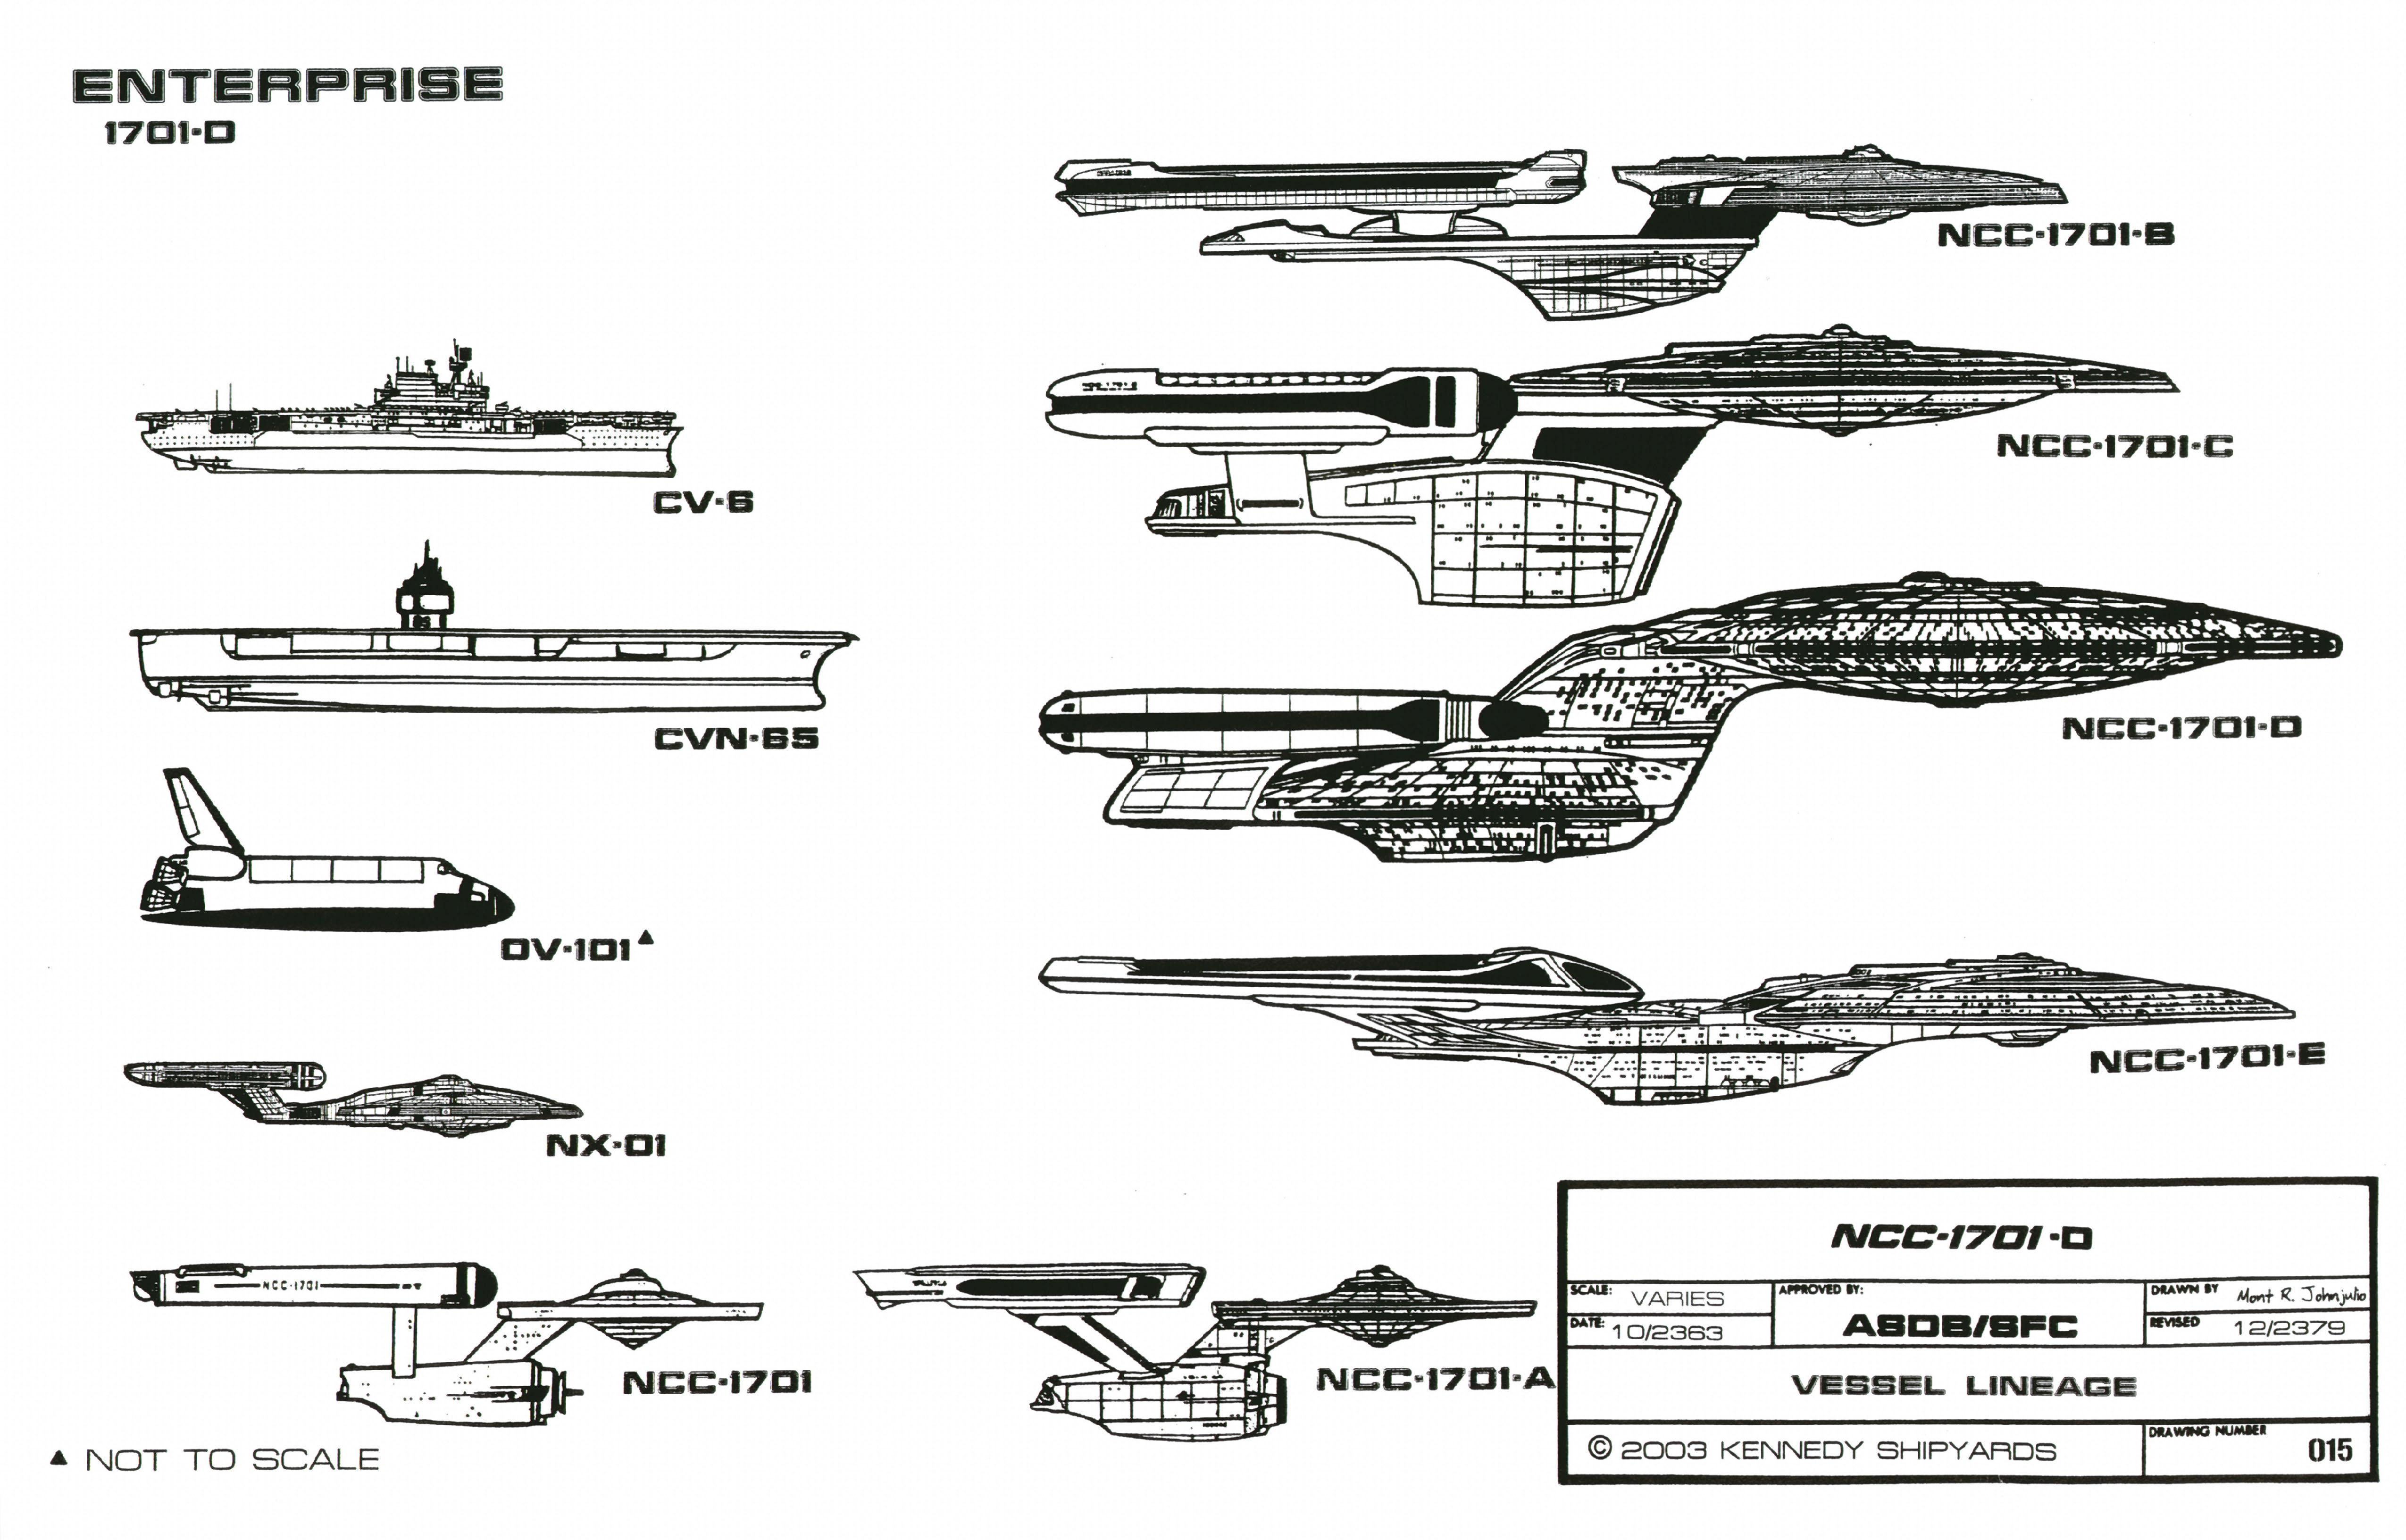 Star trek blueprints starfleet vessel galaxy class starship sheet 15 vessel lineage malvernweather Image collections